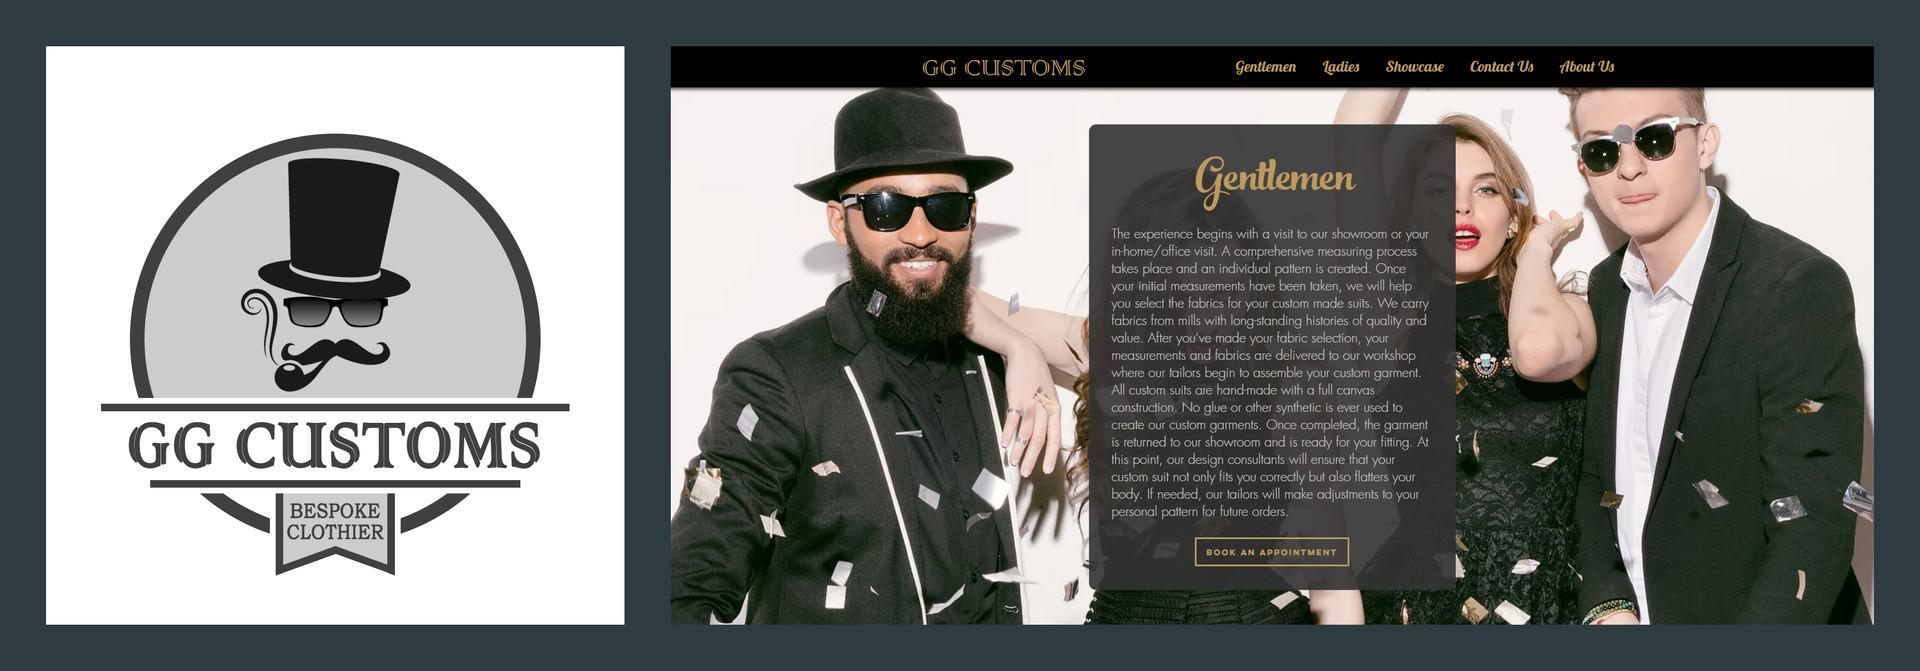 gg-customs-bespoke-clothier-responsive-website-design